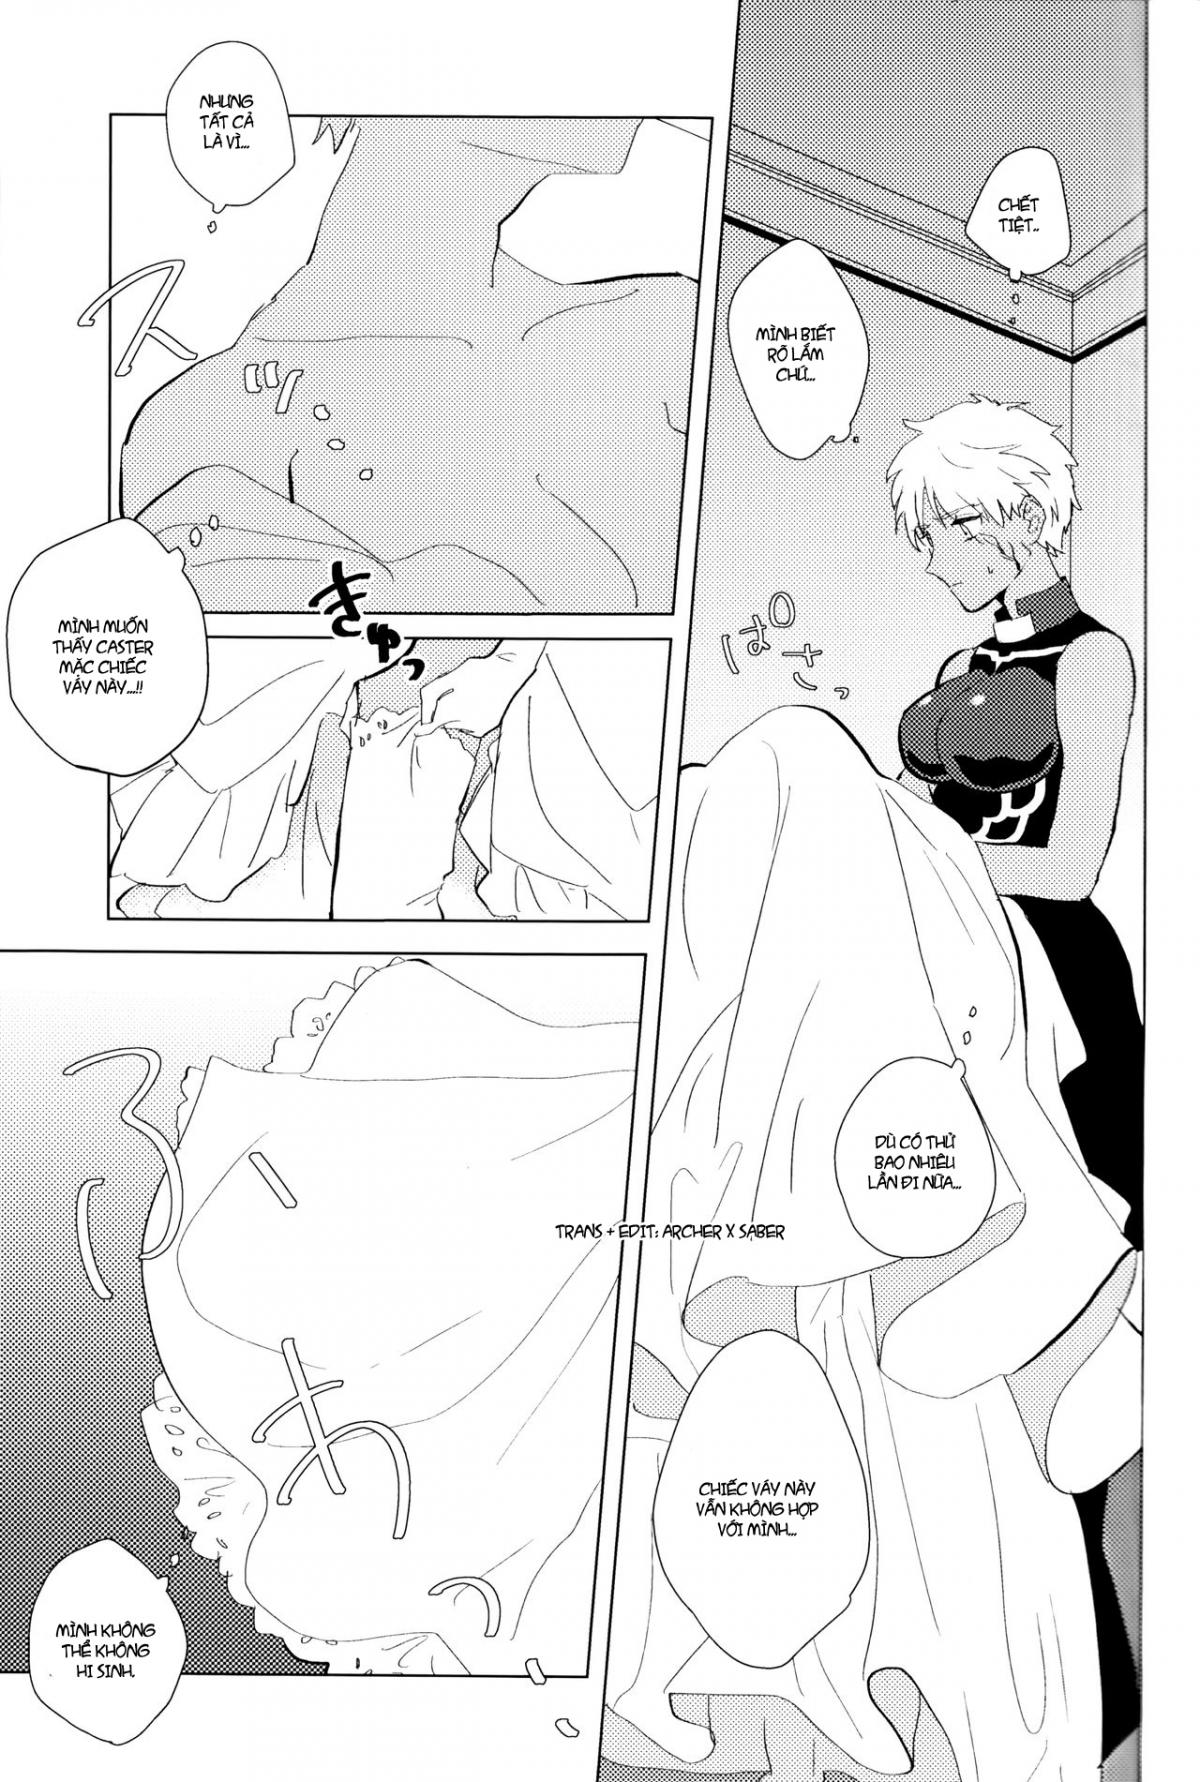 HentaiVN.net - Ảnh 12 - Seventh Heavens Story (Fate/Grand Order) - Oneshot